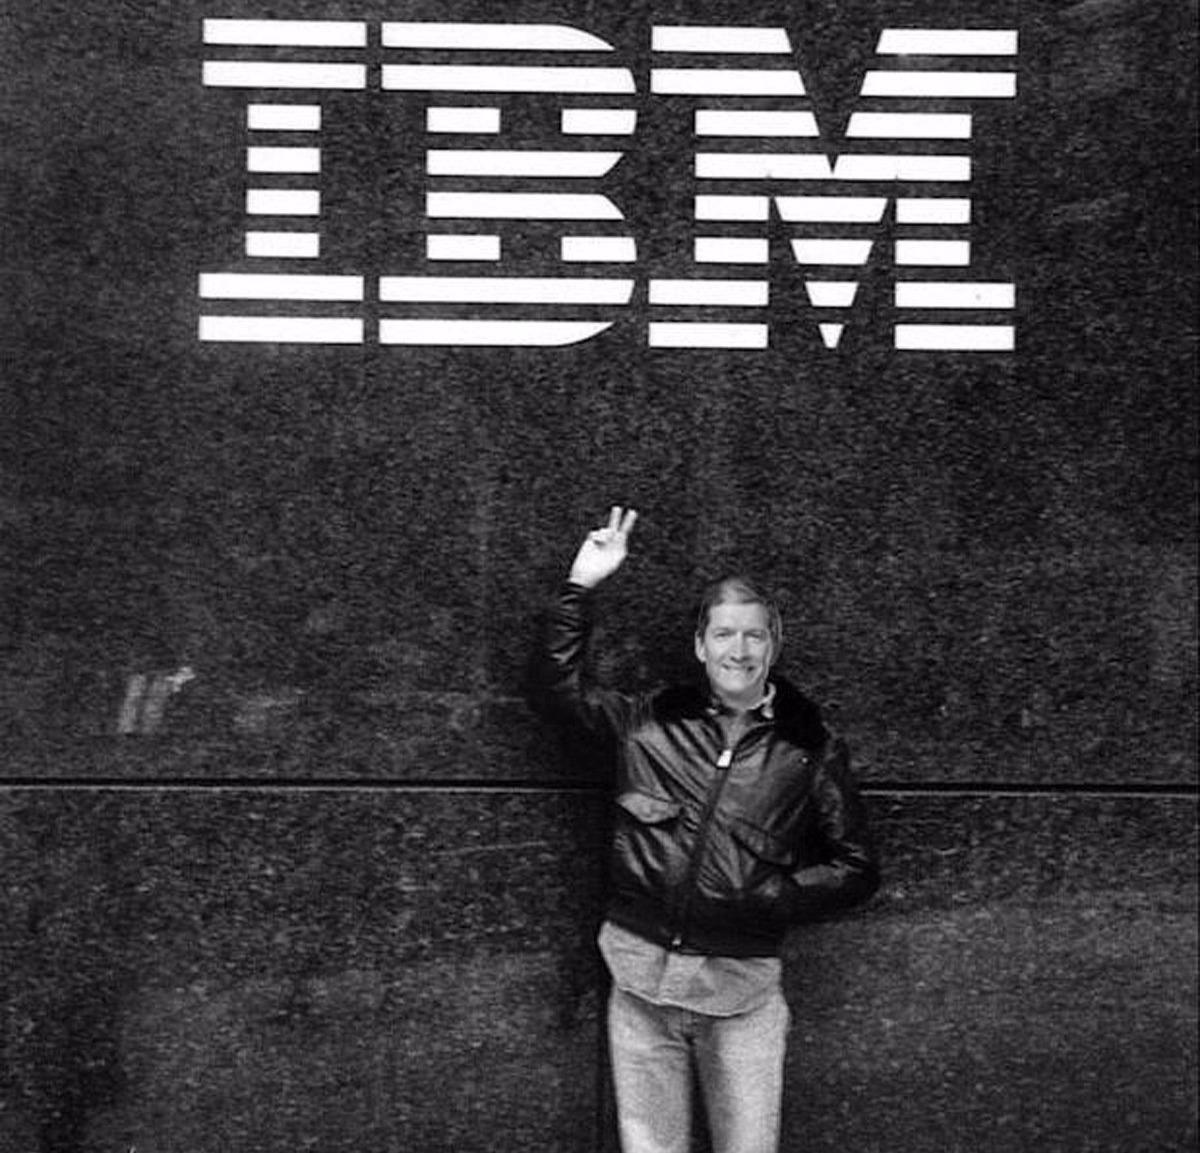 Tim Cook striking victory sign beneath the IBM logo